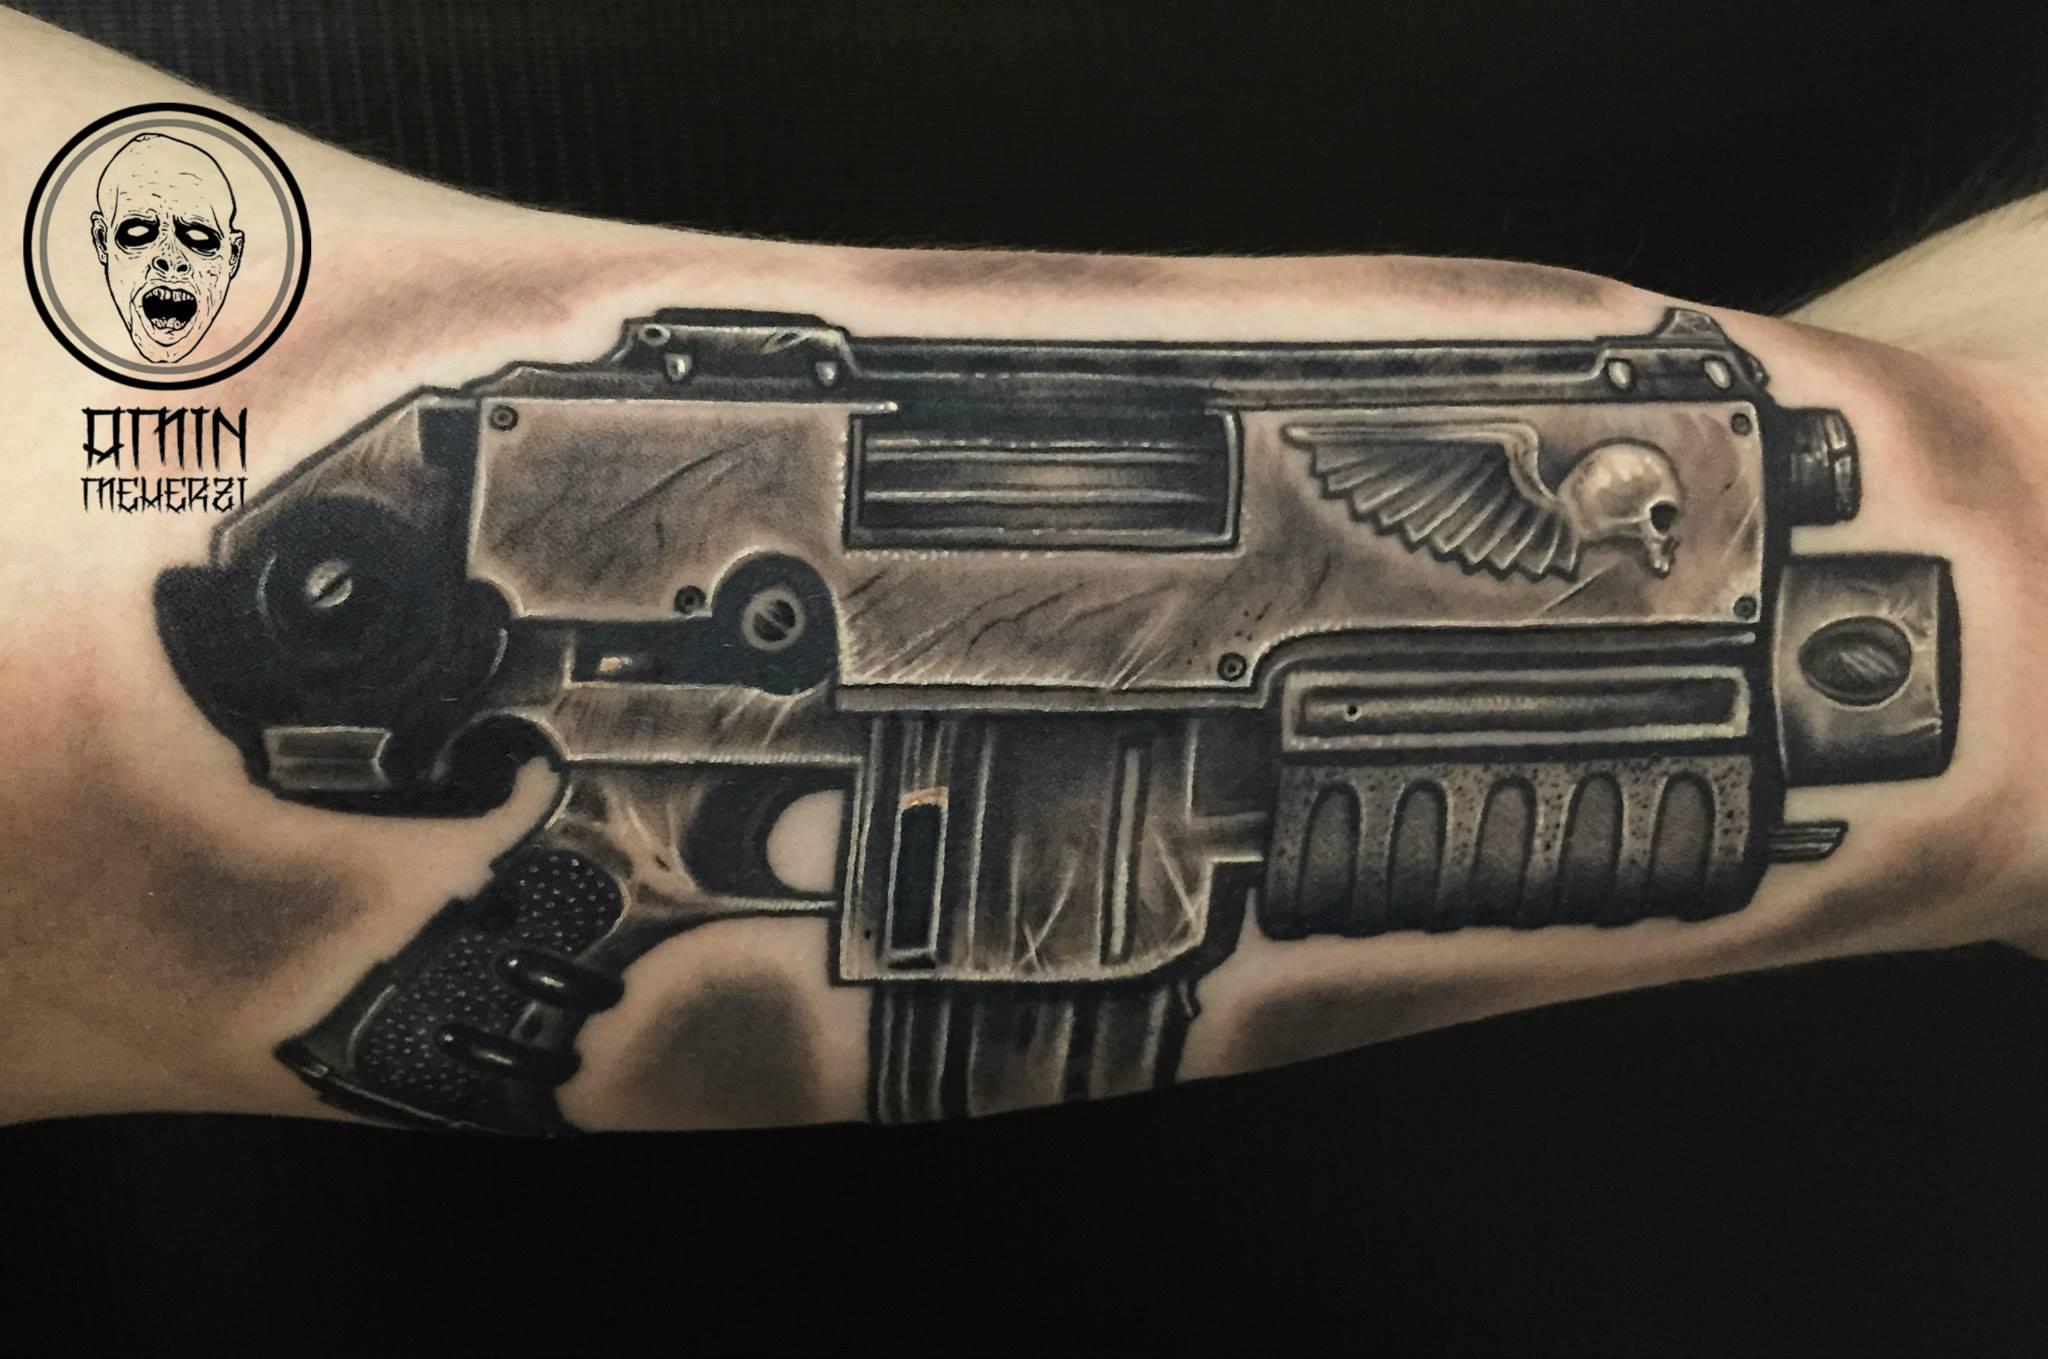 Opus Magnum Tattoo Wien Gun   Tattoolife Tattoowork Tattoo Ink Worldofink Inkmaster Tattoogirl Tattooidea Tattoos Tattooworks Viennatattoo Tattoomagazine Tattooconvention Inkwork Realisictattoo Realisticink Tattooshop Blackandgrey Blackandgraytattoo Skin Skinartmag tattoorevuemag supportgoodtattooing sharonalday tattoocommunity tattooedlife tattooed inkedup tattooculture artwork tattooscout tattoodo tattoodobabes myworldofink  tattu tatu opusmagnumtattoo killerink besttattoo besttattooing bestoftattooink tattooing mastertattoo mastertattooing mastertatu mastertattooer tattooer besttattooever bestinktattoo besttattooartist  tattooartist reasliticartist realistictattooartist tattooingartist  inkartist awsometattoo awsomtattooartist awsomtattooartists awsomtattooing awsomink awsomtattoorealistic awsomtattoohyperrealistic nicetattoo nicetattooart nicetattoowork nicetattooink nicetattooart famoustattoo famoustattooart famousartwork famostattooartist goodtattooing goodtattoos goodtattoorealistic tattooconvention inportainttattoo importainttattooart importainttattoowork importaintartist importantrealistictattoo importainttattooing tattoogun amintattoo aminart aminmeherzitattoo amintattooartist amin aminartist meherzitattoo aminmeherzi 1150wien schweglerstaße skintattoo tattoooftheday tattoooftheweek tattooofthejear tattooprice tattooinfinity tattoos tattooblack tattooapointment tattooaustria usatattoo lining liningtattoo insta instagram facebook fb projecttattoo project love fun progressing progress artofopusmagnum artofopus artofmagnum sullen sullentattoo sullenart sullenink worldfamousink killerinktattoo killerink killerinkamin shading shadingtattoo  sullen sullenfamily girlswithtattoo boyswithtattoo inkedman inkedboy inkedgirl design style tattoostyle lovemyjob lovetattoos wowtattoo realism realismtattoo realismtattooart silverbackink silverbacktattoo silverback tattooartgallarie gallerie galleri pritty prittytattoo prittytattooidea prittytattooing freshlyink freshlyink